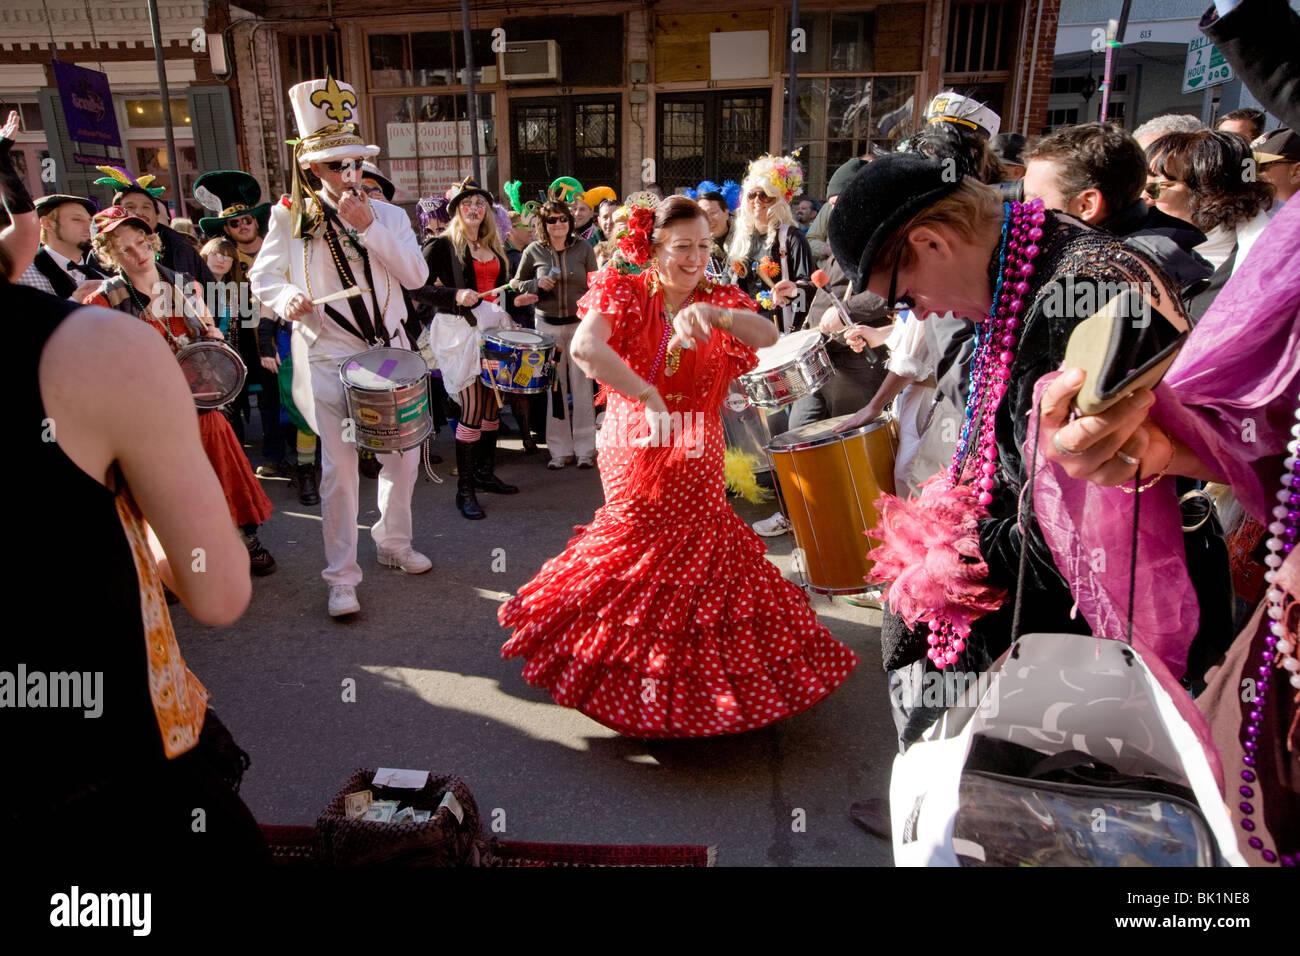 French Quarter Festival Stockfotos & French Quarter Festival Bilder ...